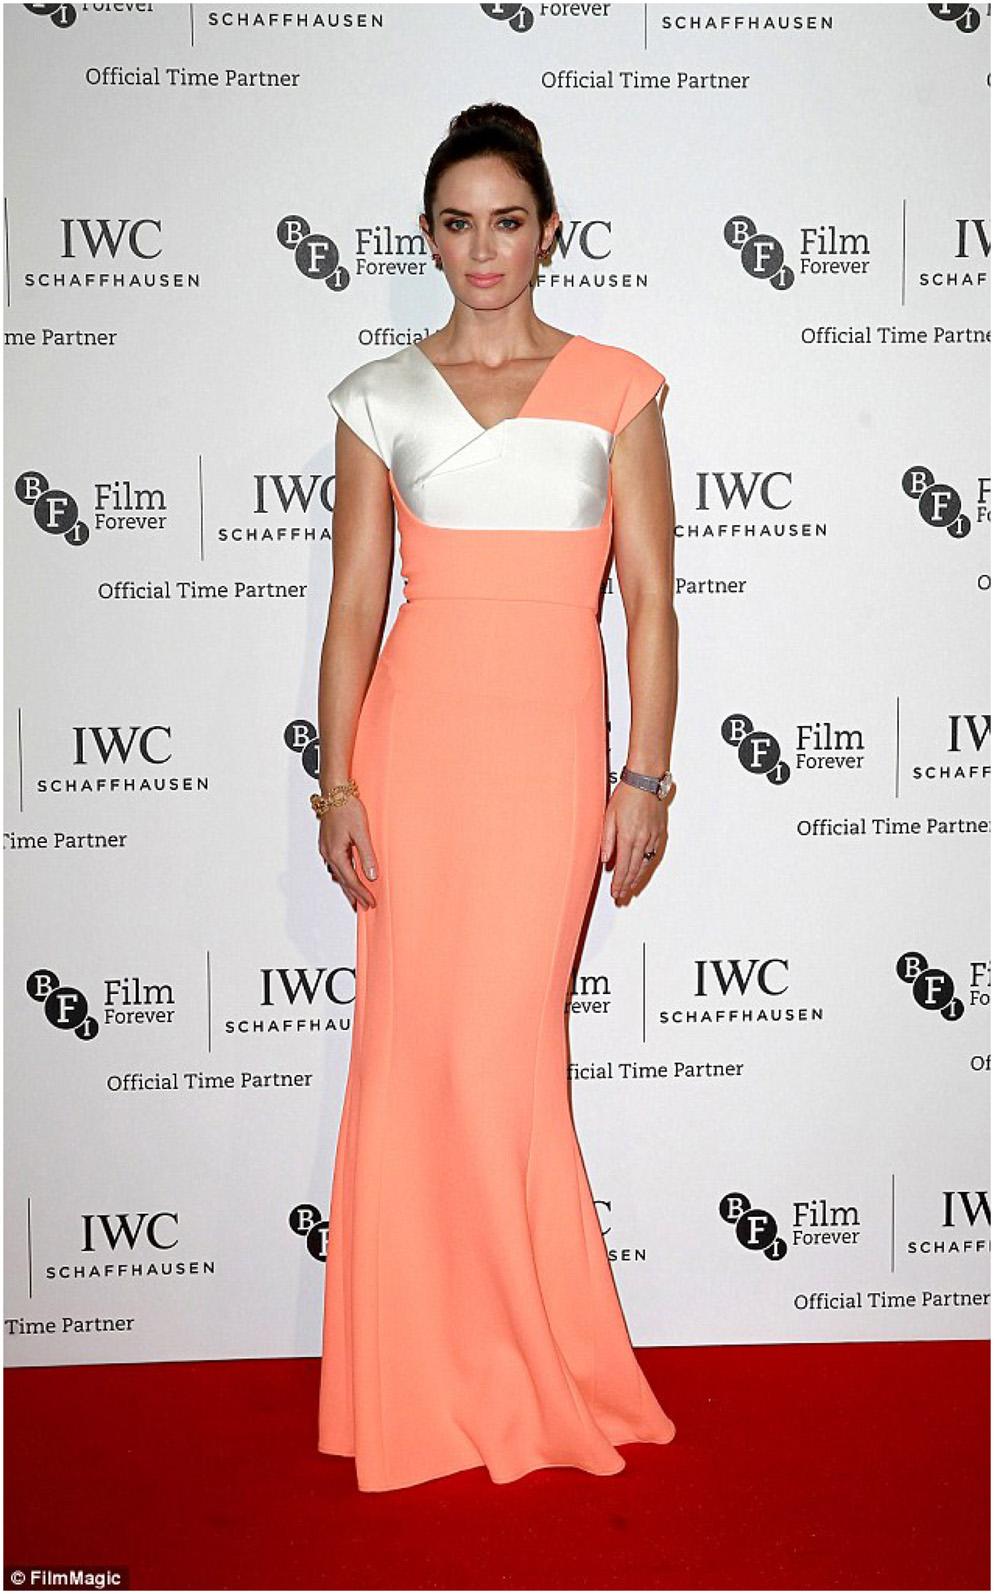 Dress Inspiration: BFI Film Festival October 2014